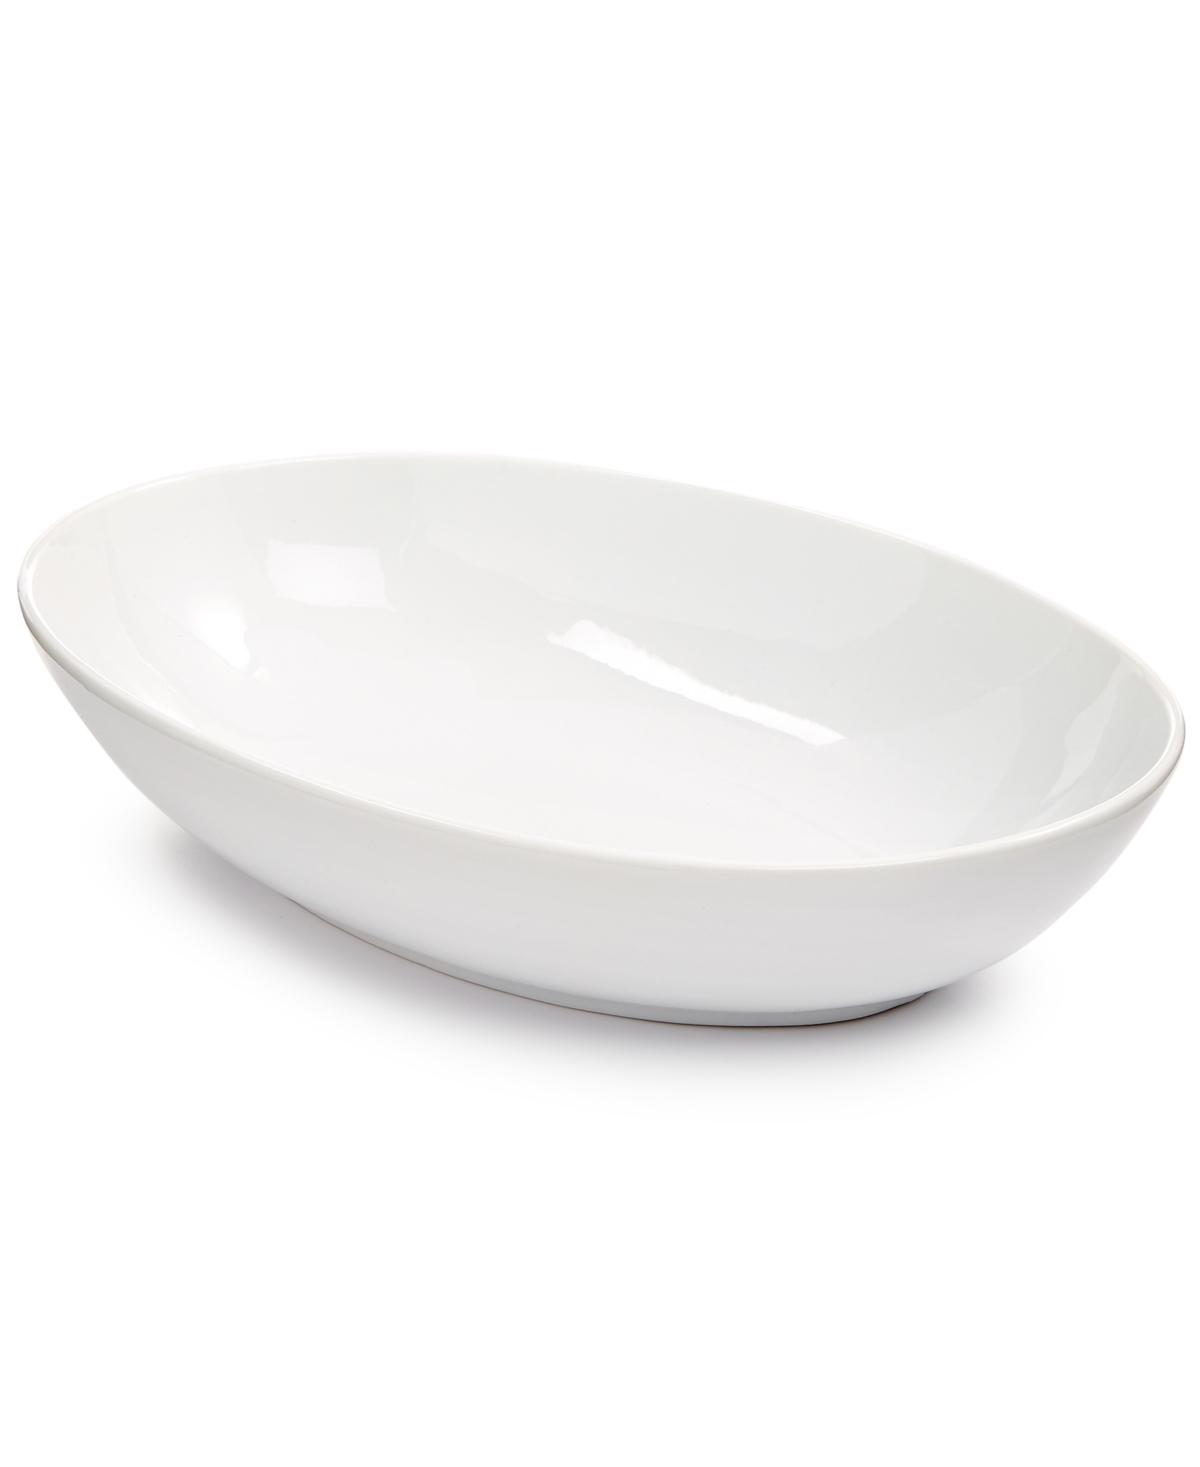 oval vegetable bowl